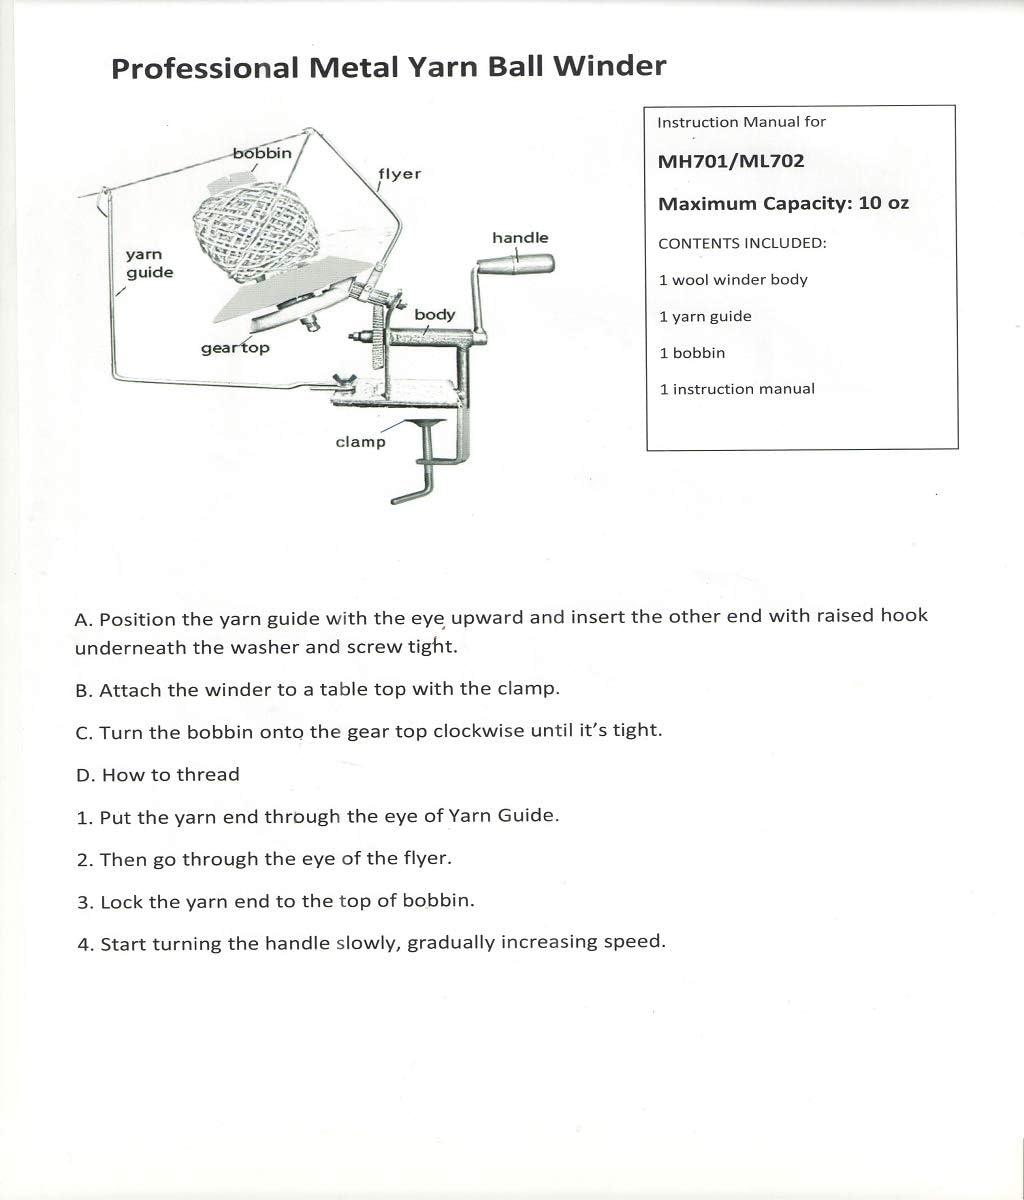 Large Yarn Ball Winder - Yarn/Fiber/Wool/String Ball Winder Hand-Operated - 10.23 x 7.08inch